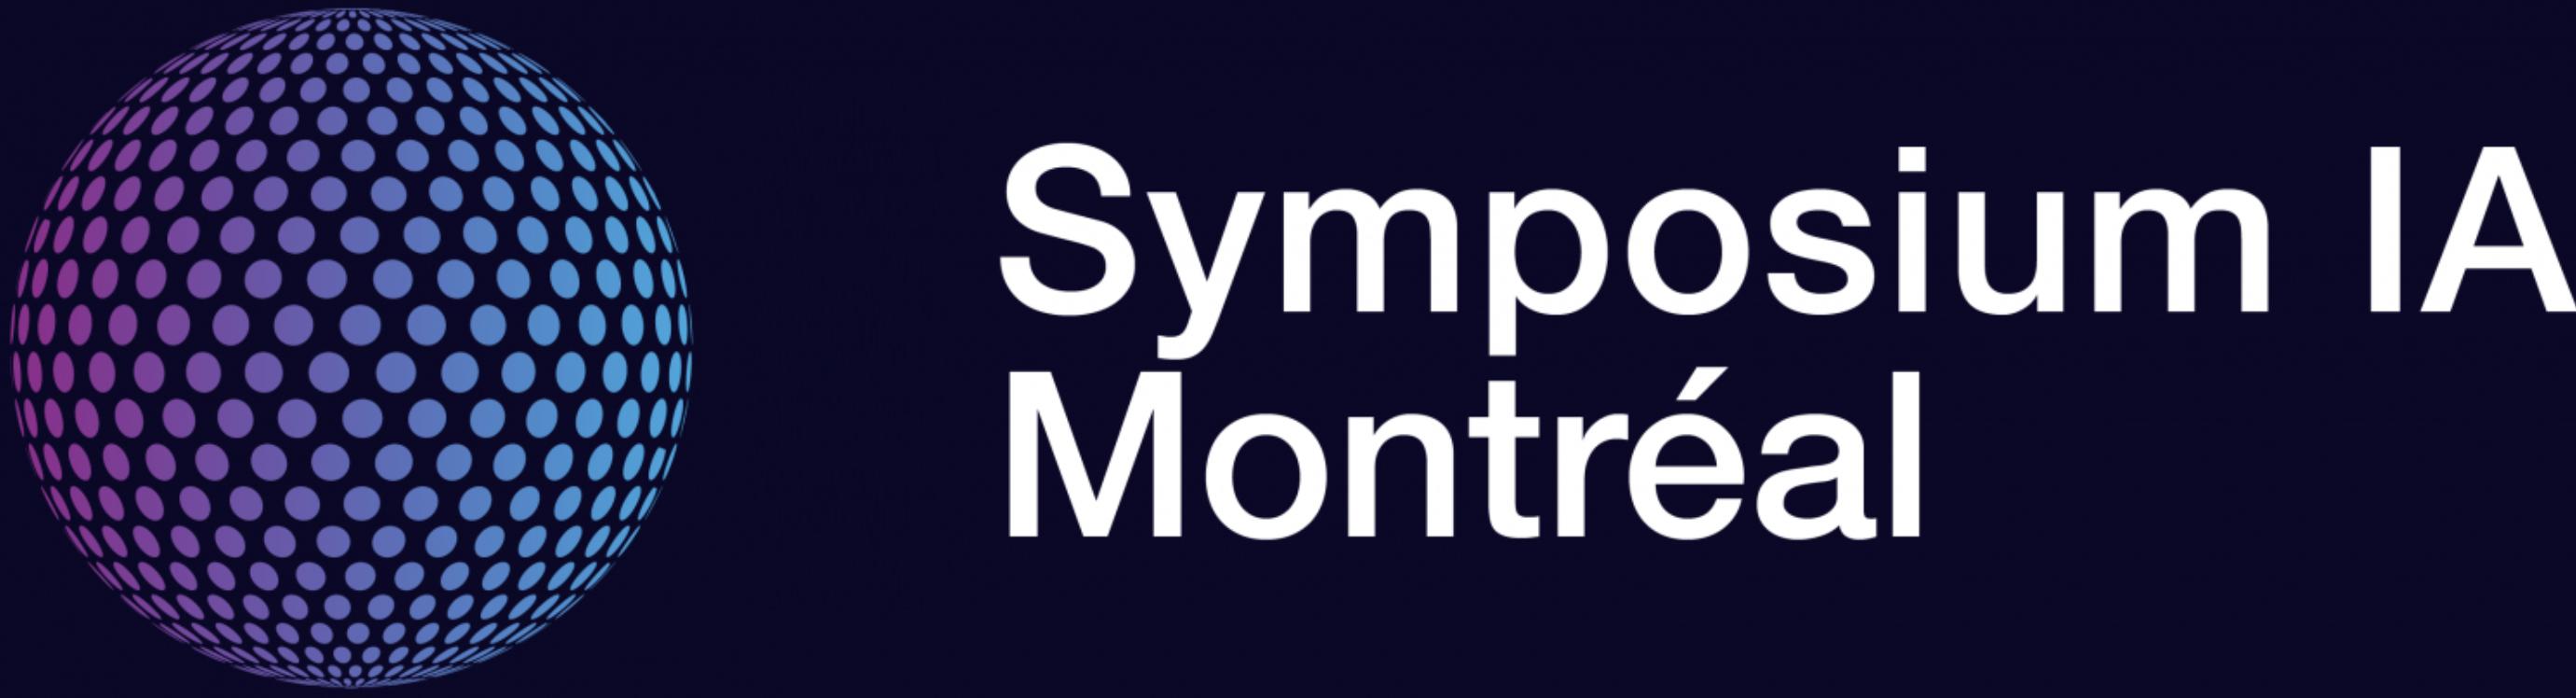 montrealaisymposium com